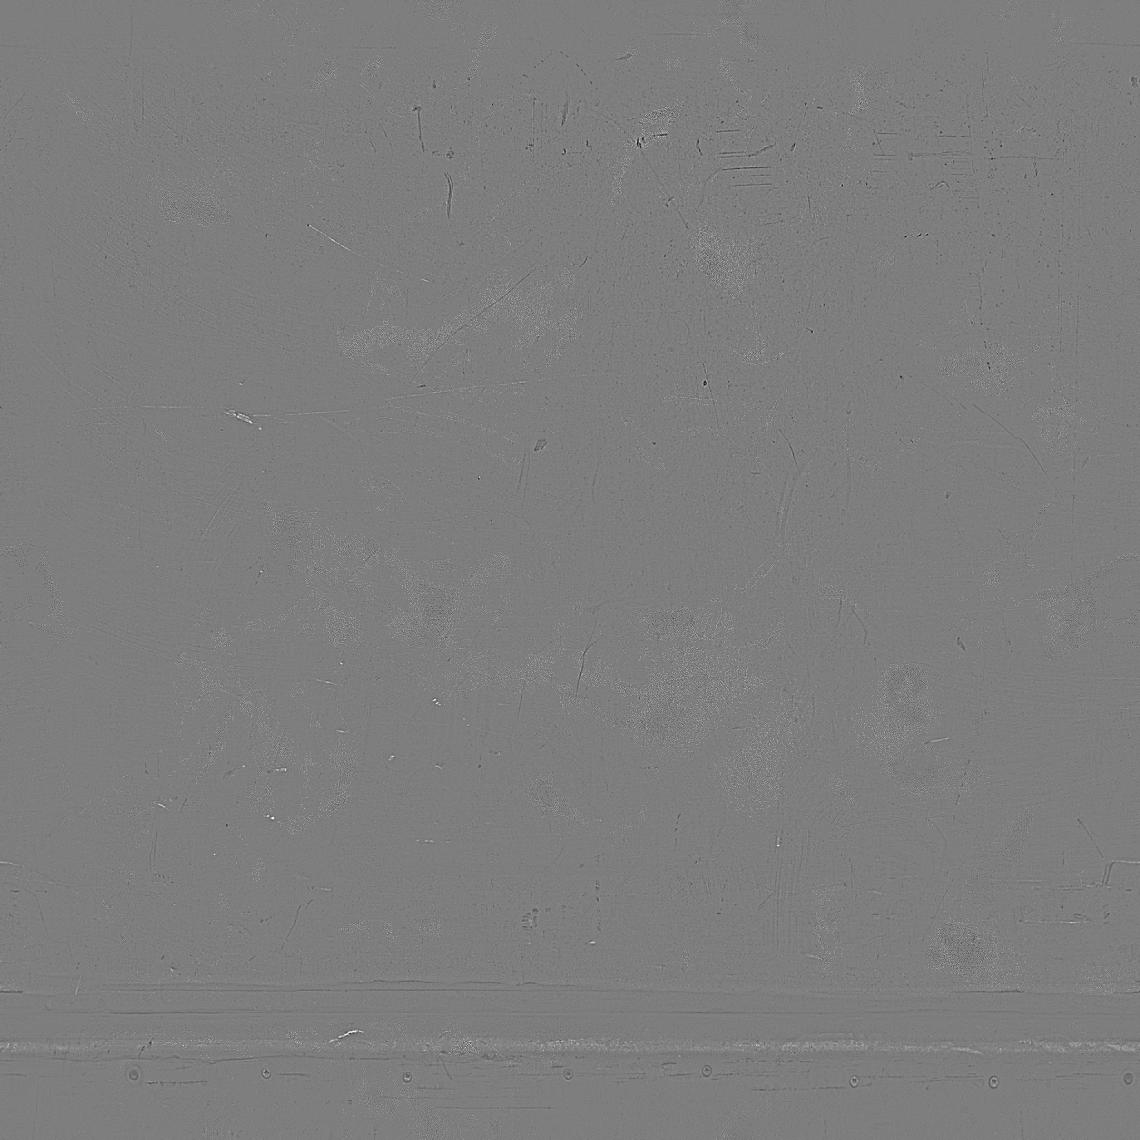 Plain-Metal-01-Curvature